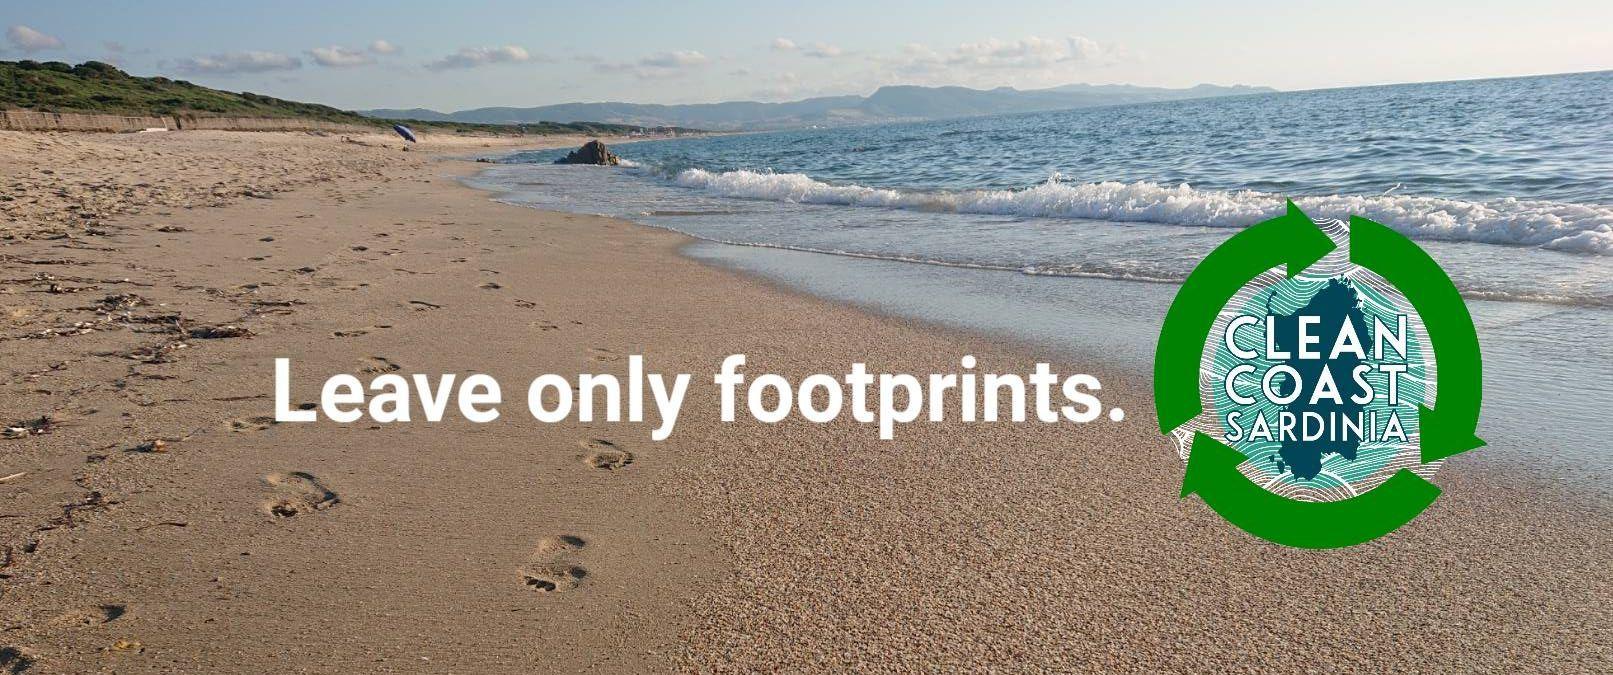 clean coast sardinia